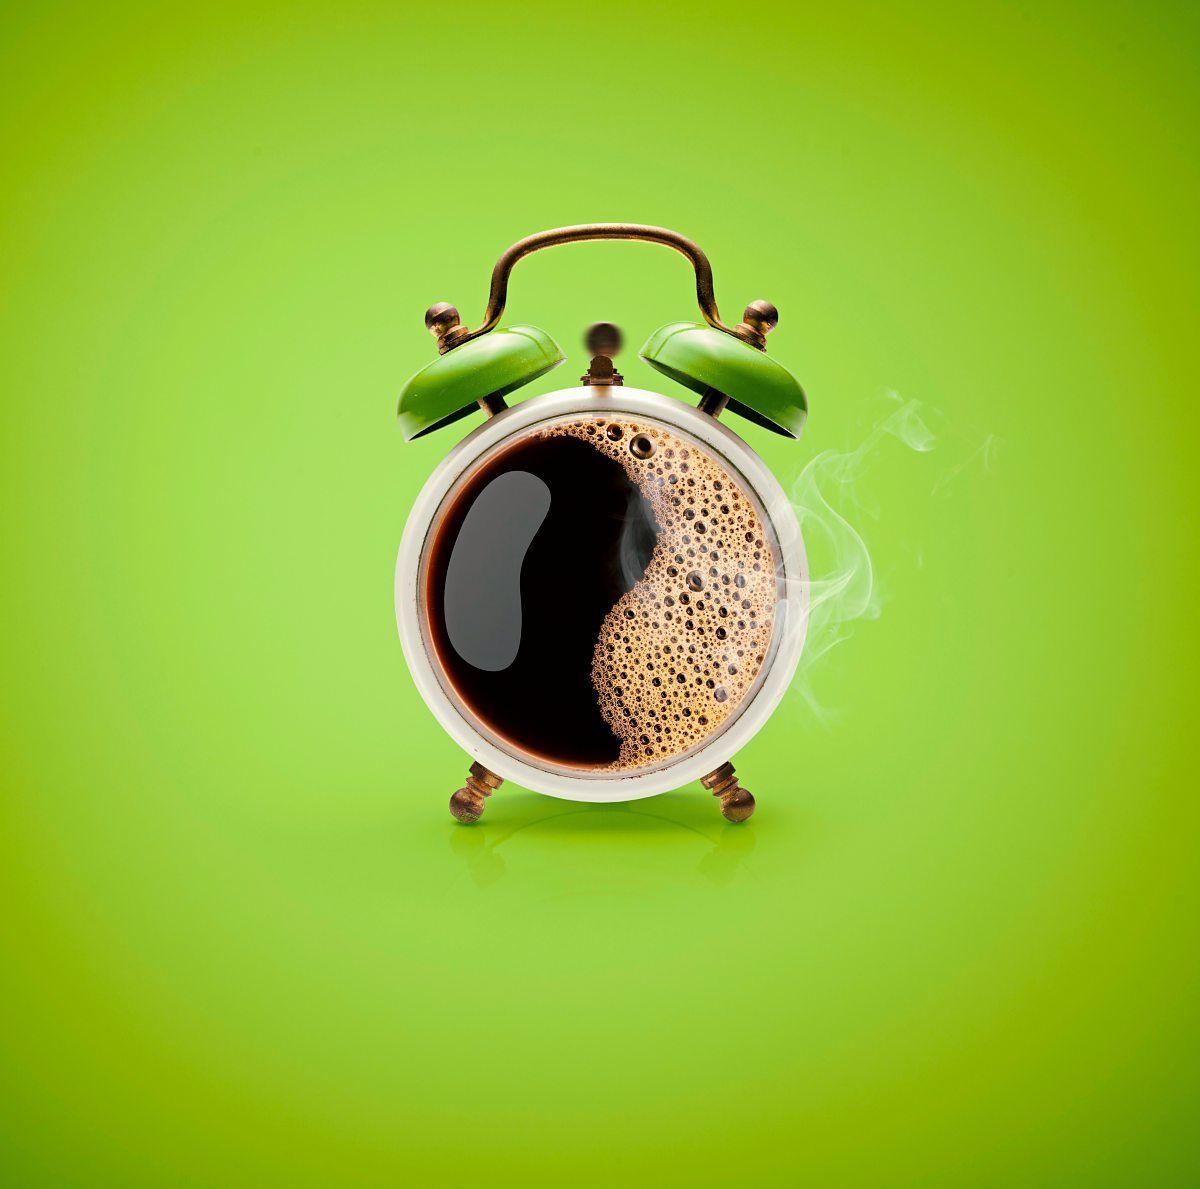 configurar alarma android